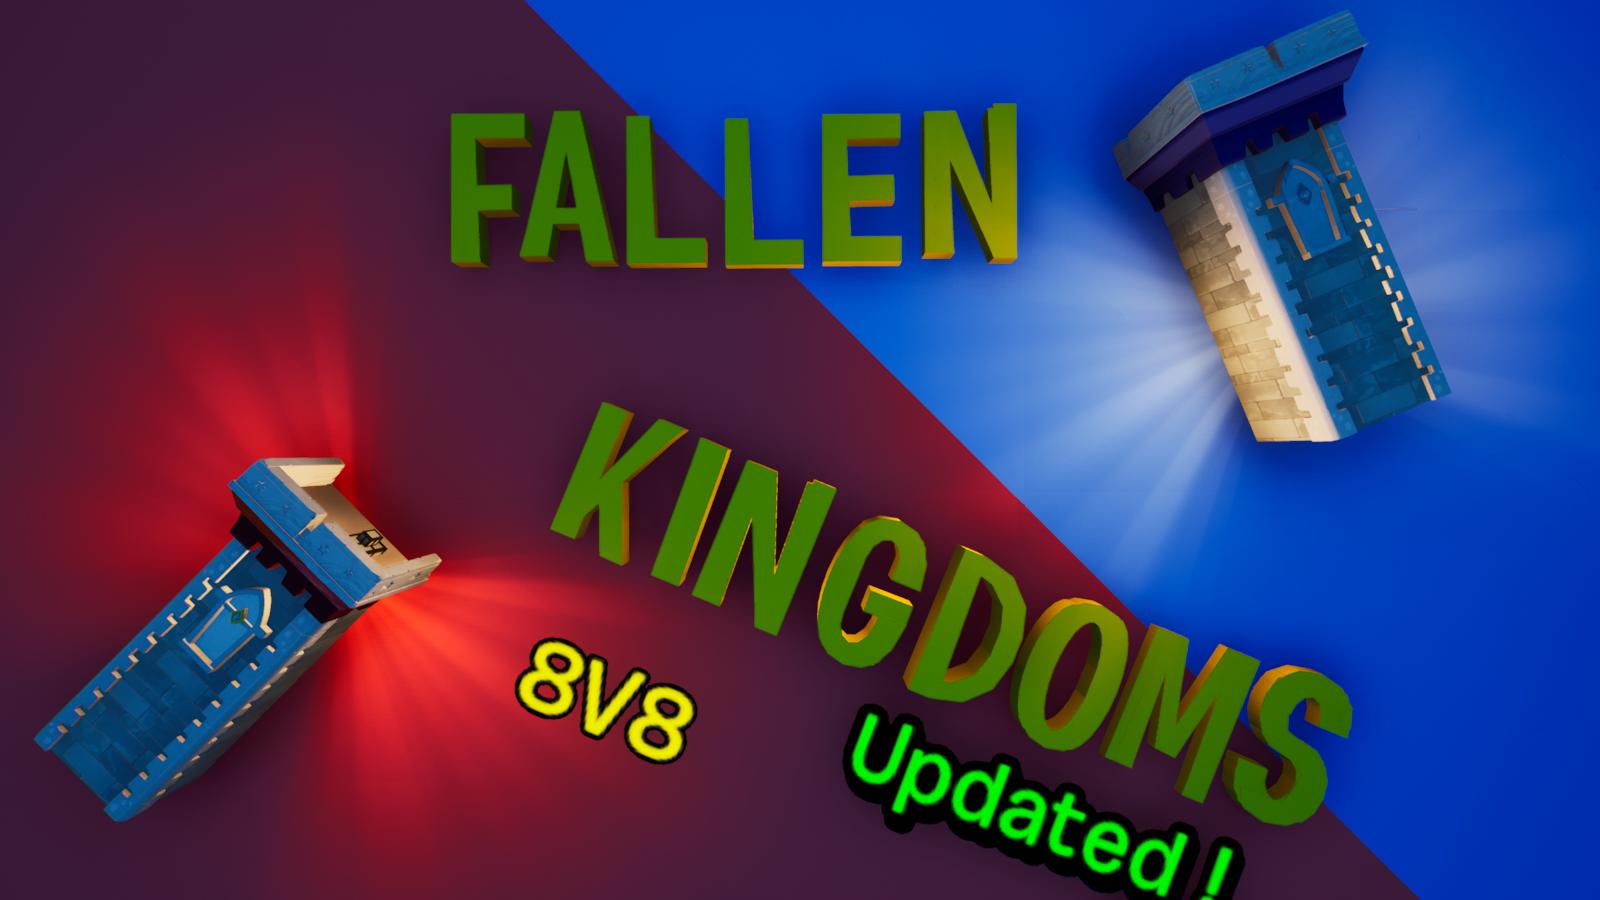 🏰 Fallen Kingdoms 🏰 - 8V8 - 💯 6384-5215-3517 by wiskstars